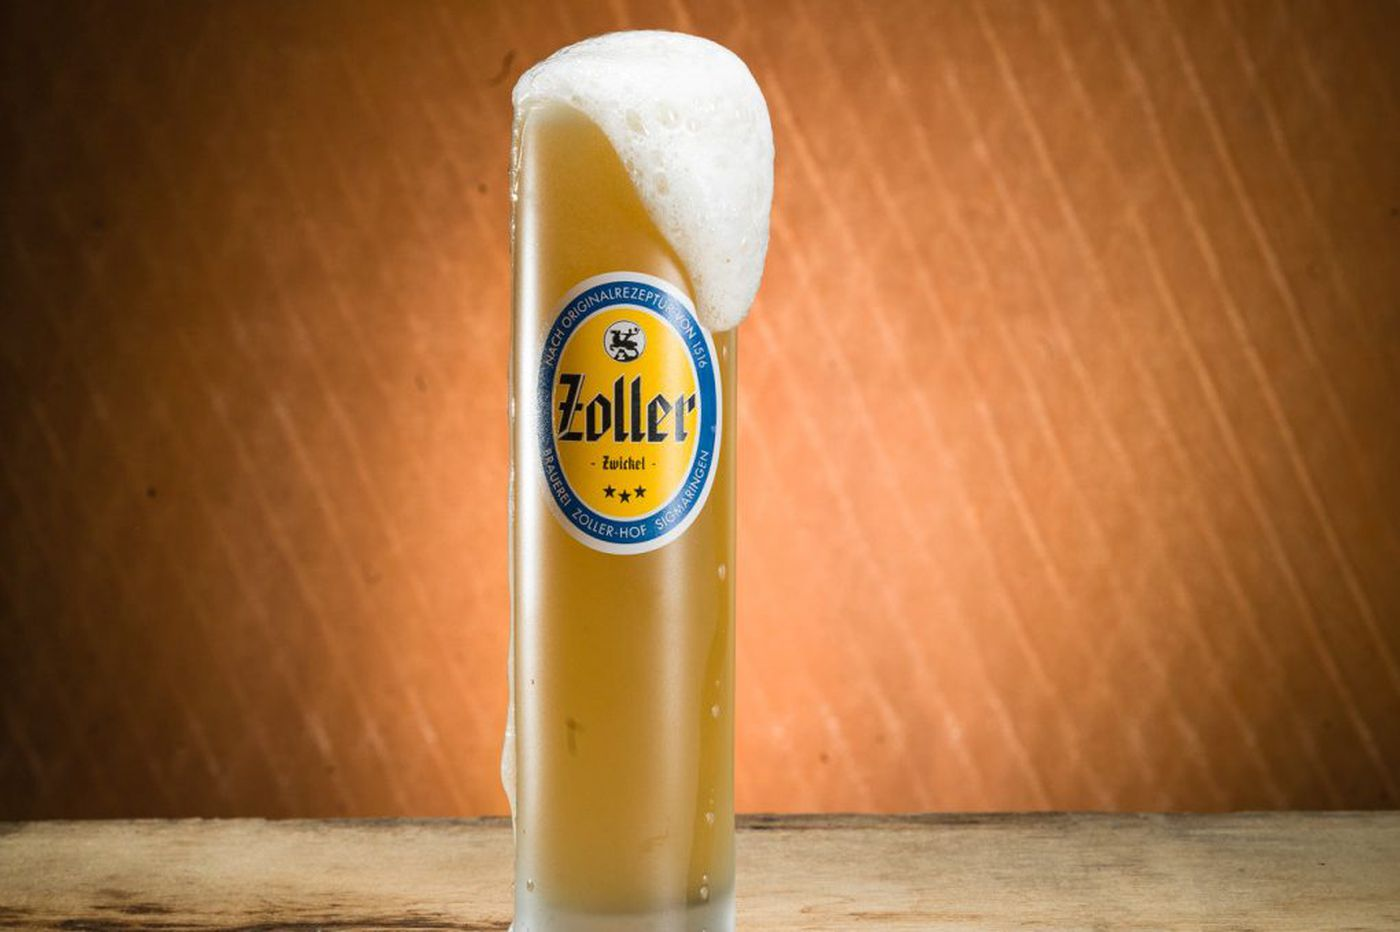 German beers get crafty, creative (and hoppy!) at coming Bierfest